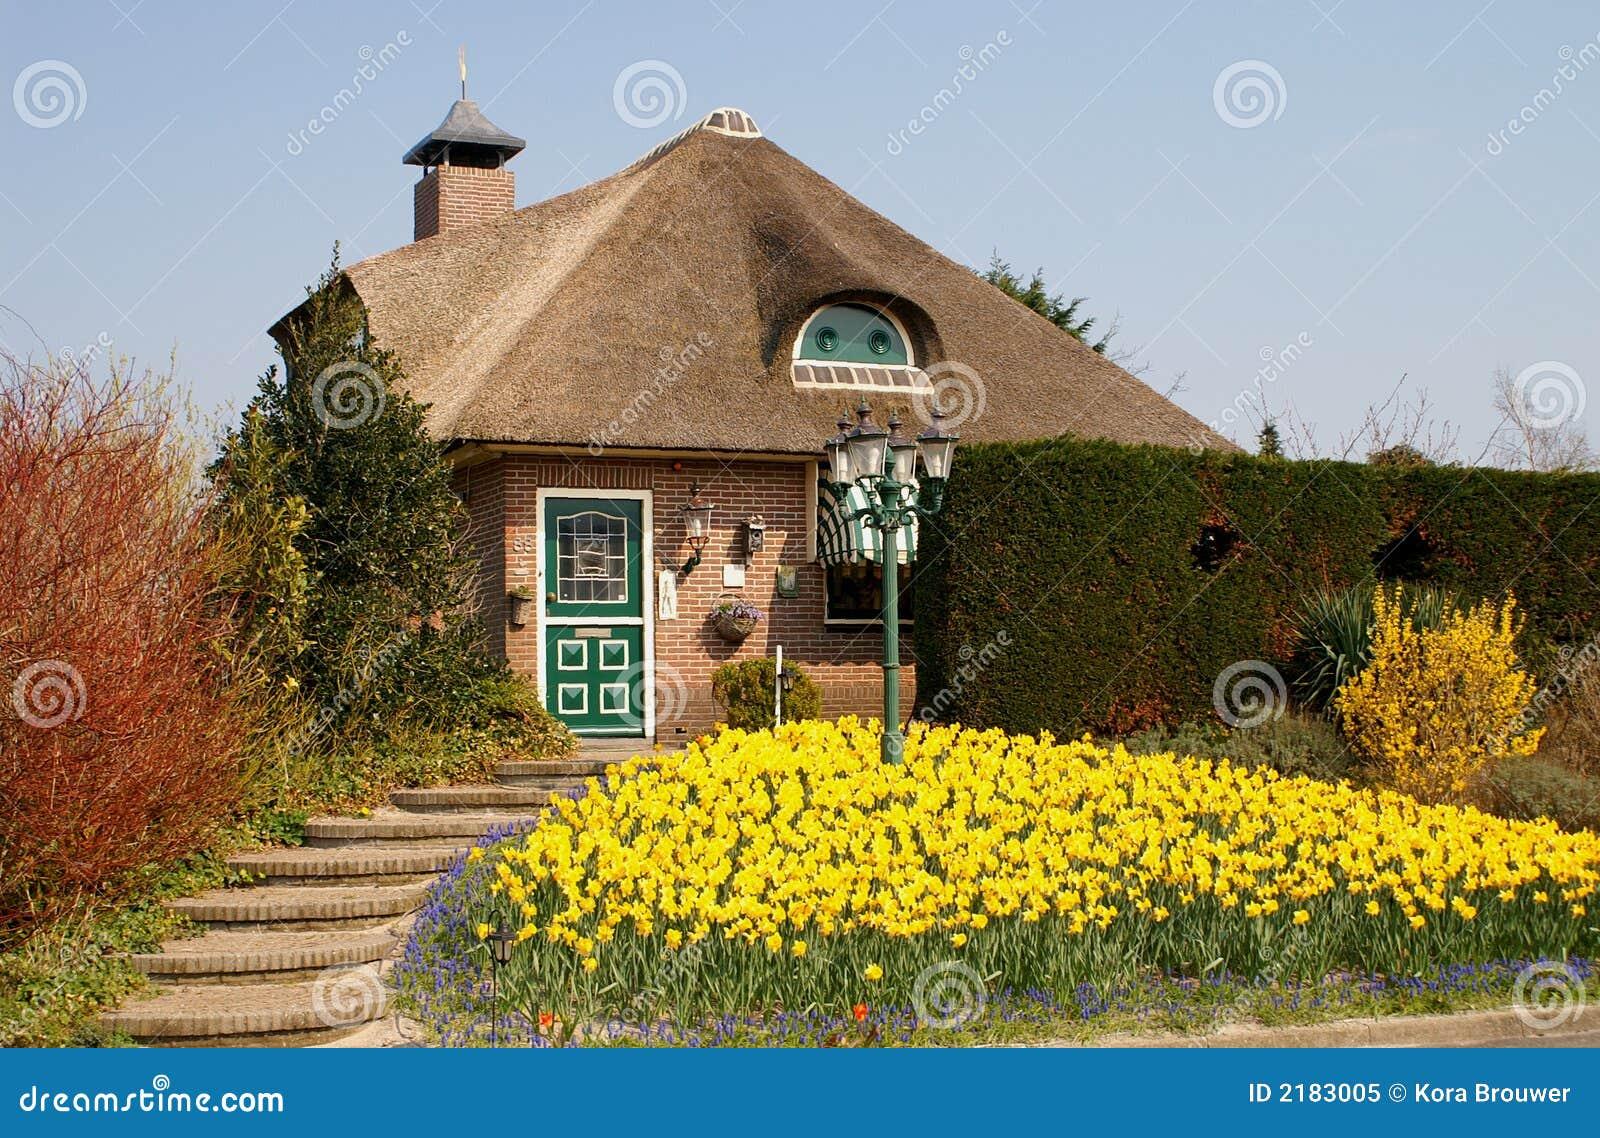 Farm house royalty free stock photo image 2183005 for Farm house netherlands